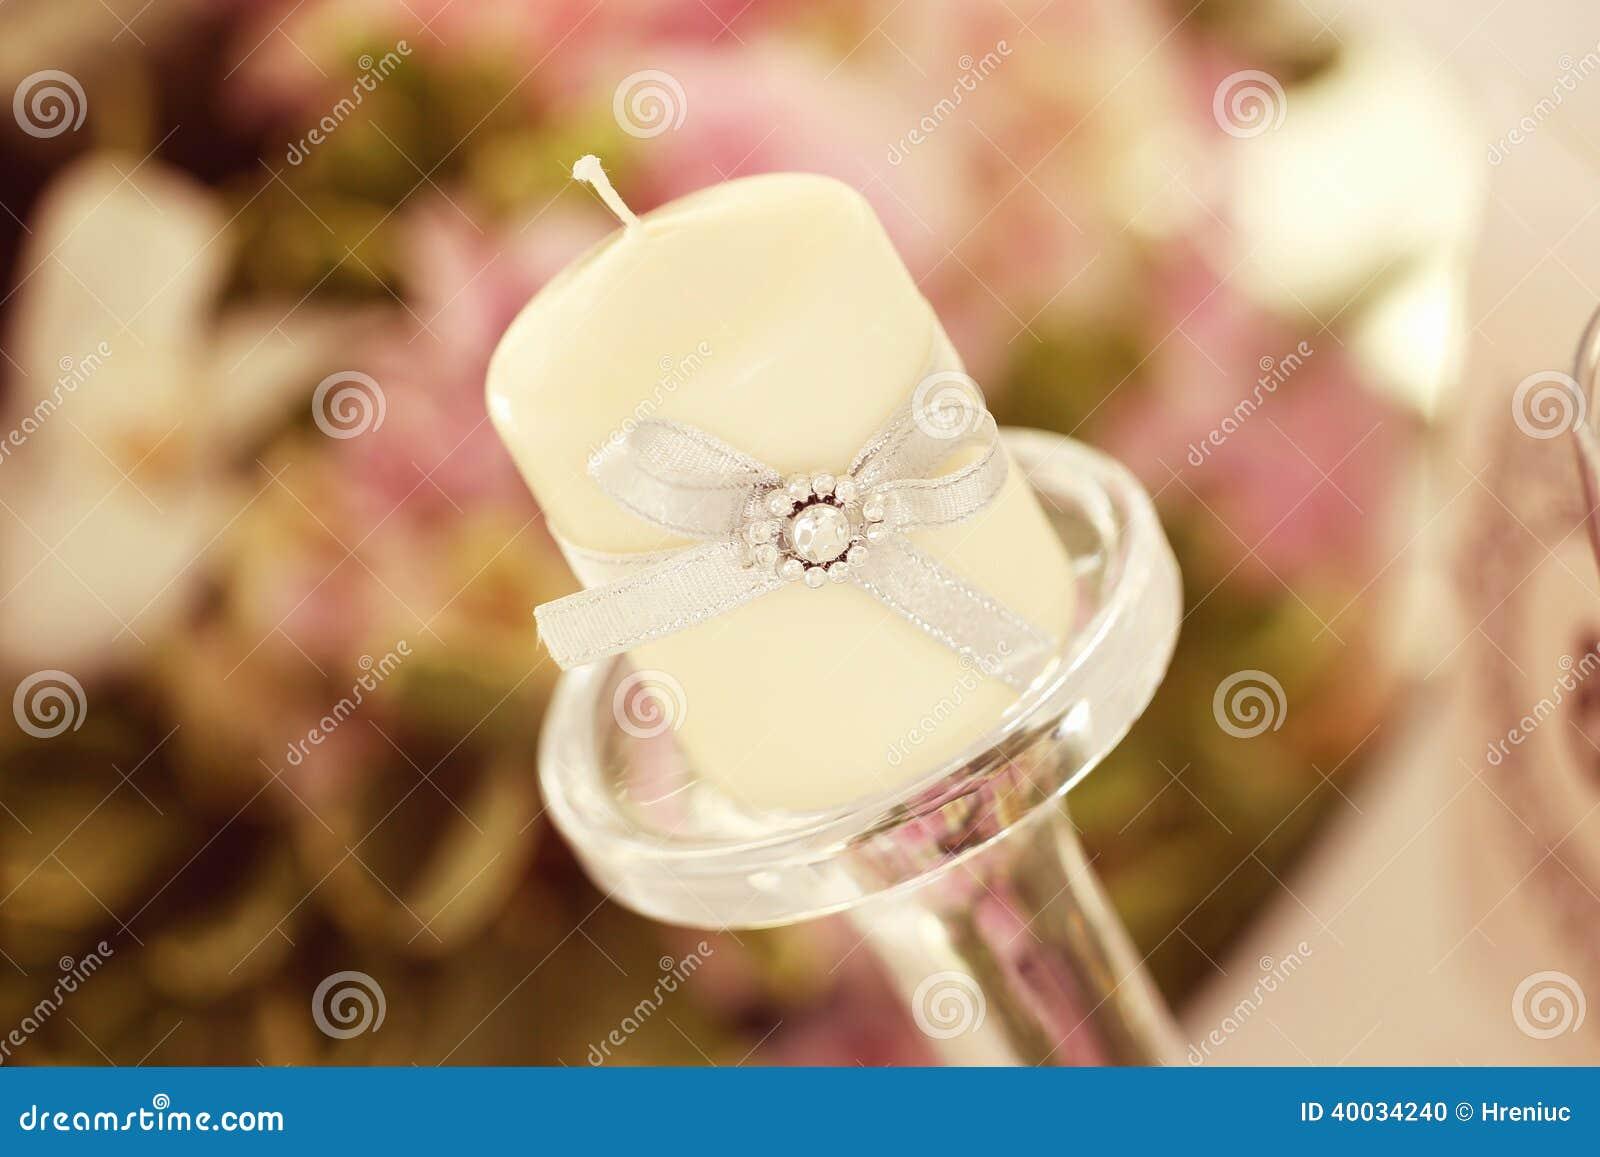 Stock Photo: Wedding table candle decoration